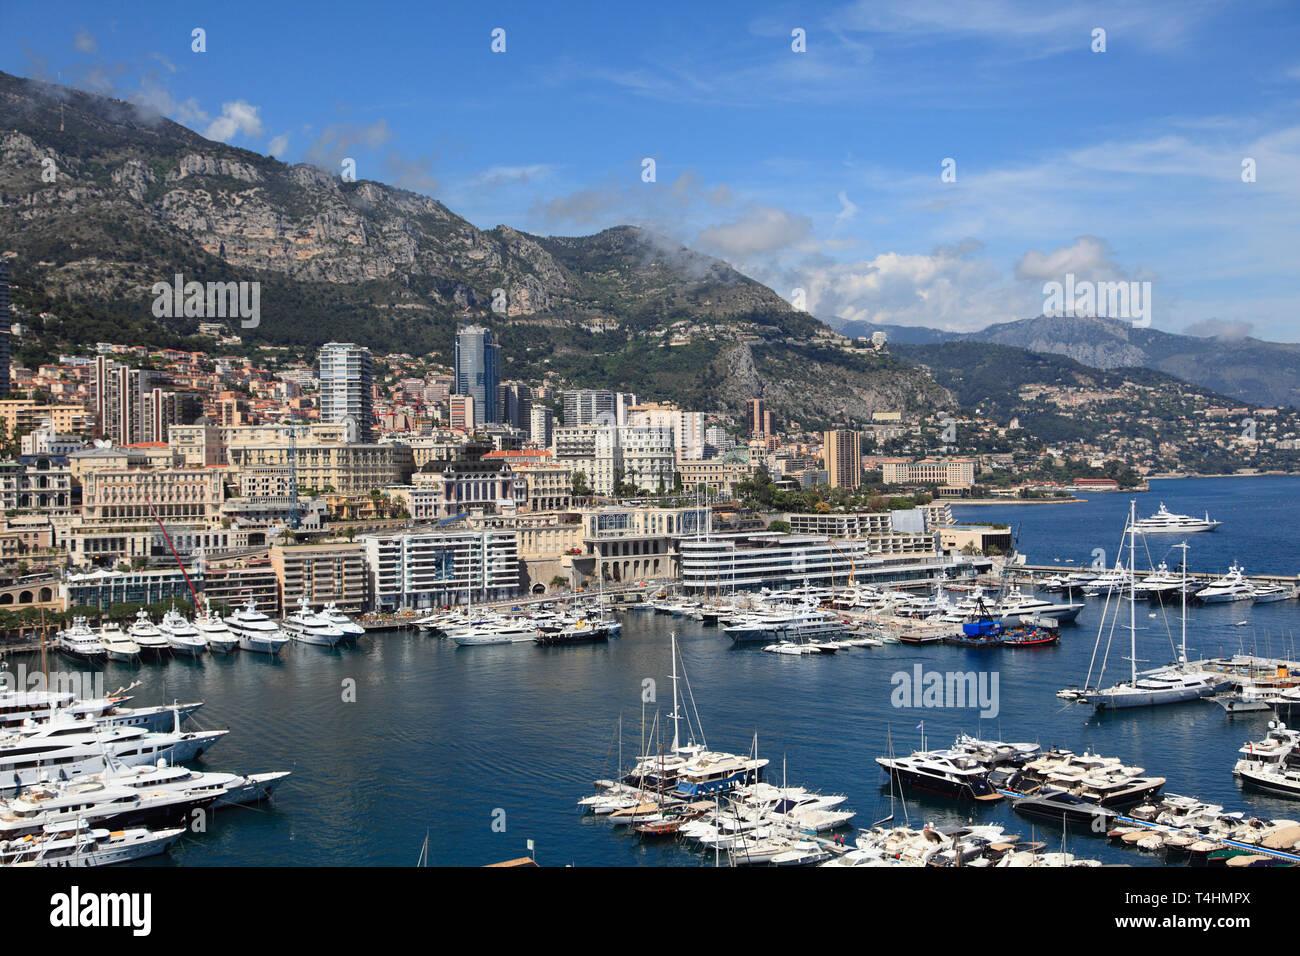 Port Hercules, Harbor, Monte Carlo, Monaco, Cote d'Azur, Mediterranean, Europe - Stock Image